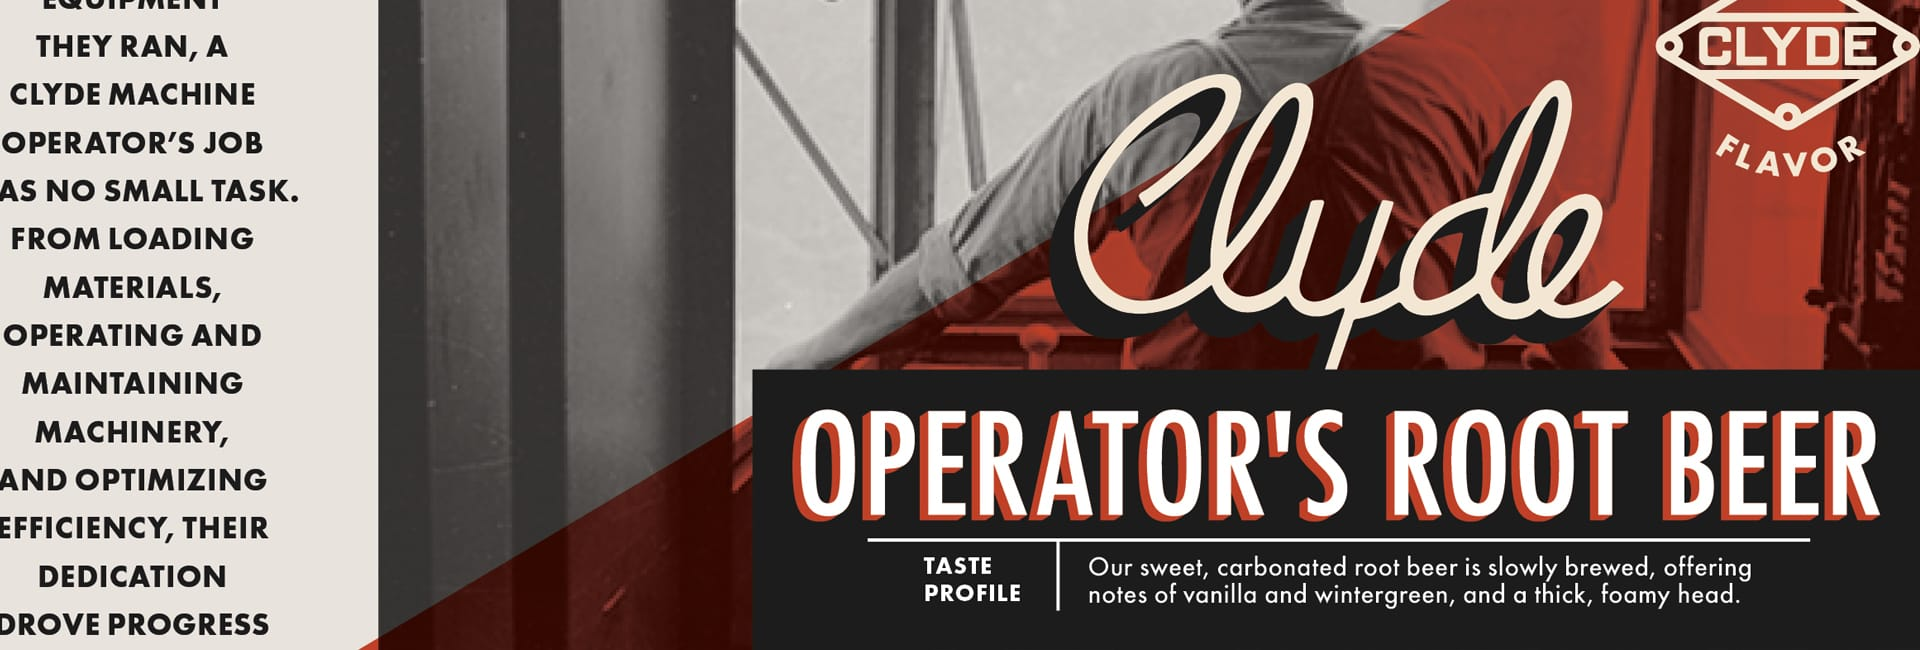 Clyde Iron Works Operator's Root Beer